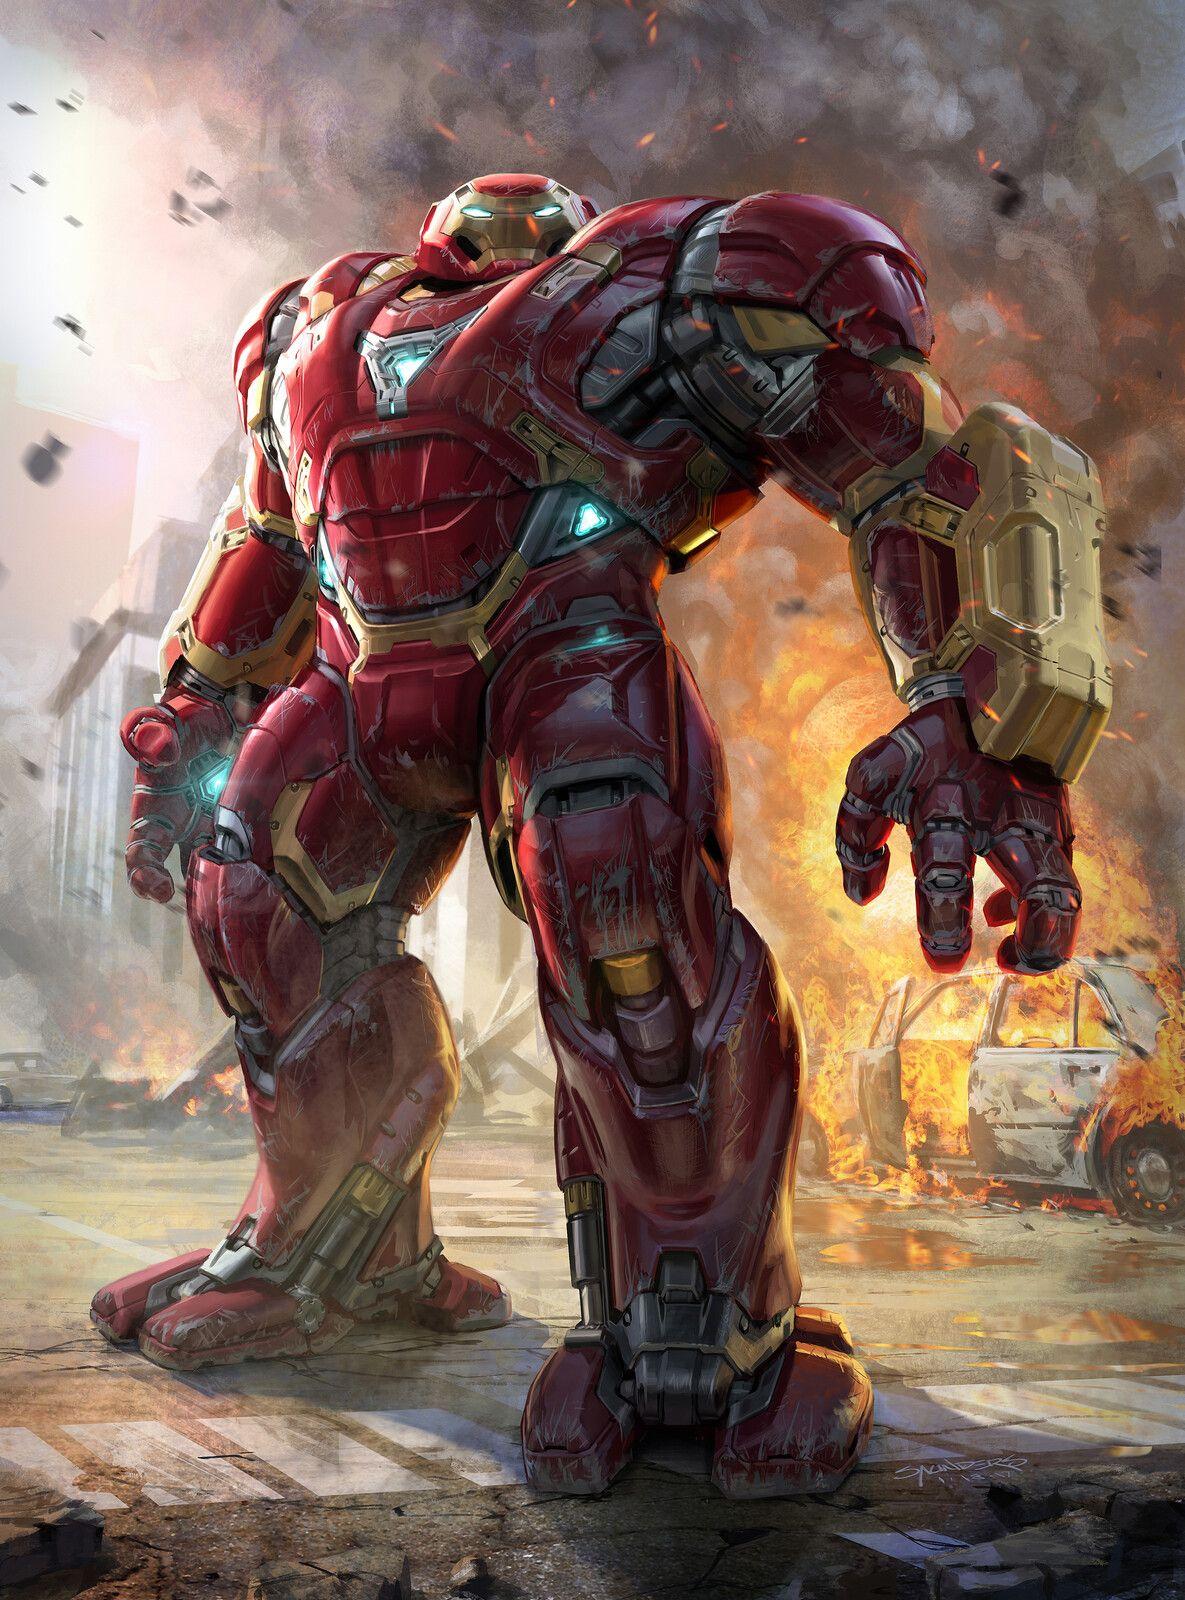 Avengers Infinity War 2017 Hulkbuster Mk2 Concept Phil Saunders On Artstation At Https Www Hulk Buster Art Iron Man Hulkbuster Marvel Comics Wallpaper